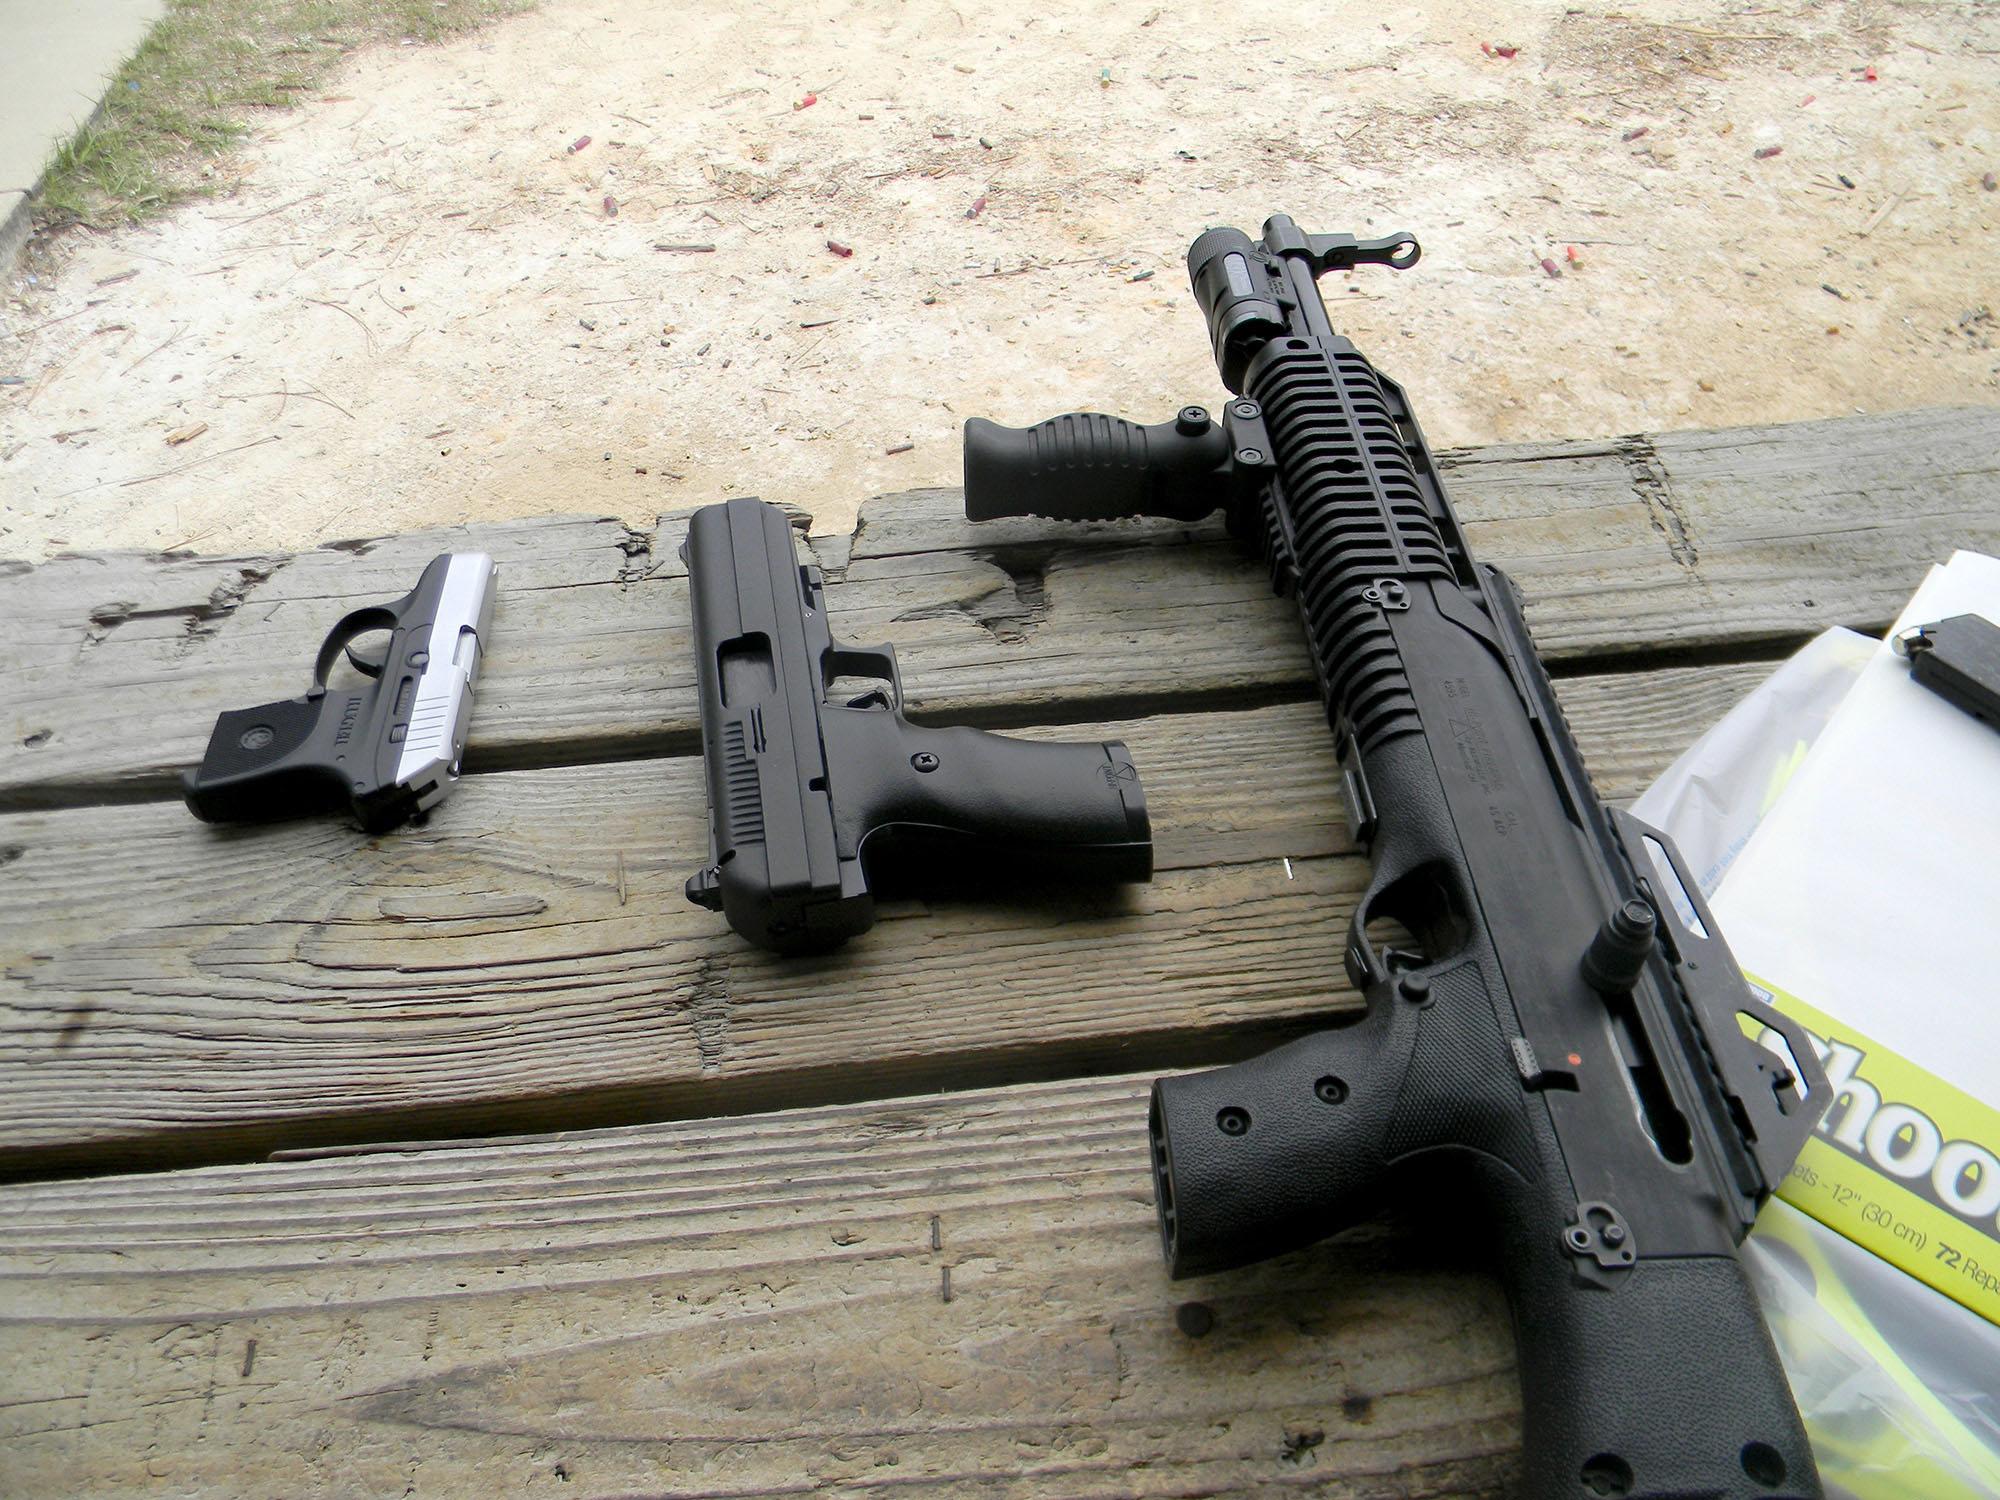 Obama's re-election drives gun sales